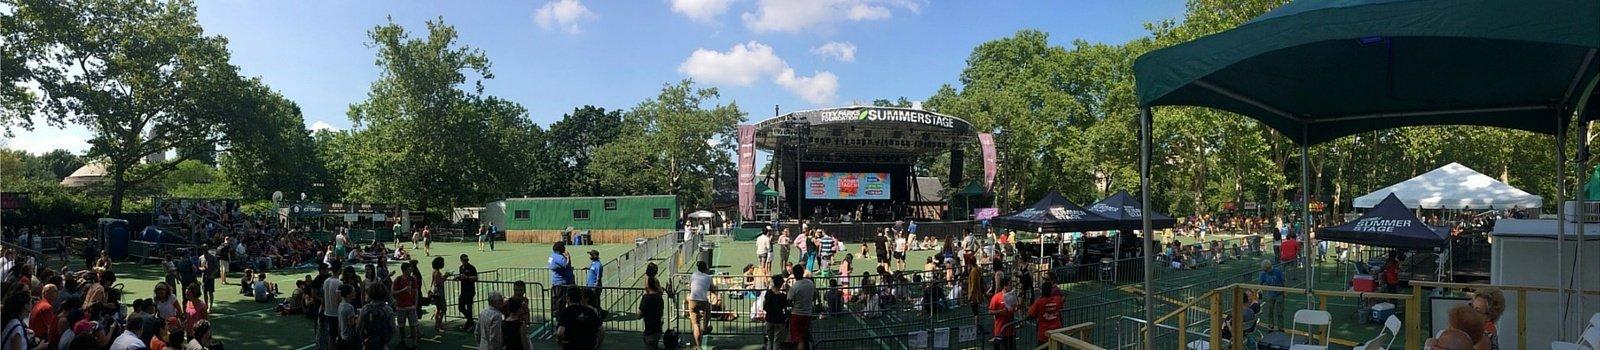 SummerStage Nueva York